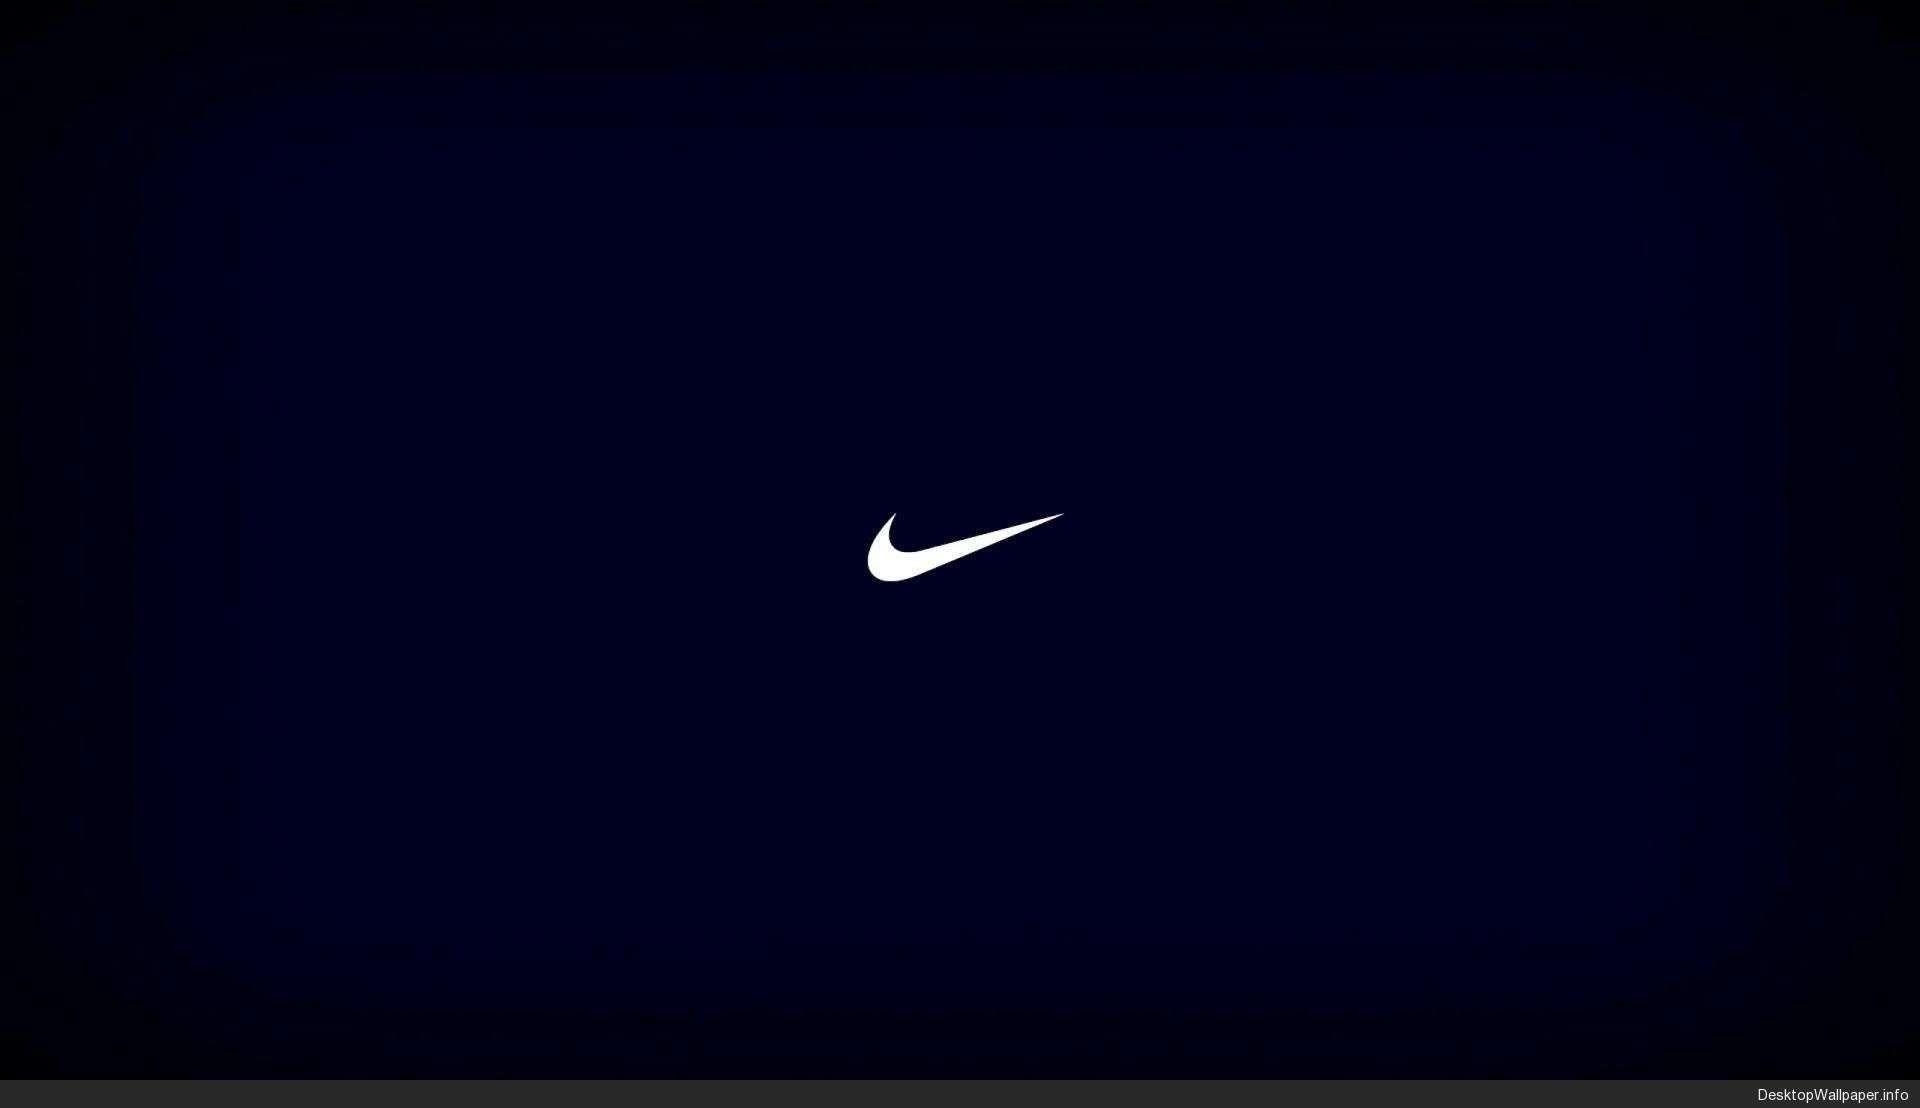 Res: 1920x1108, 1920x1080 Cool Football Wallpapers Desktop Background · Download ·  1107x1965 Black Nike Wallpaper